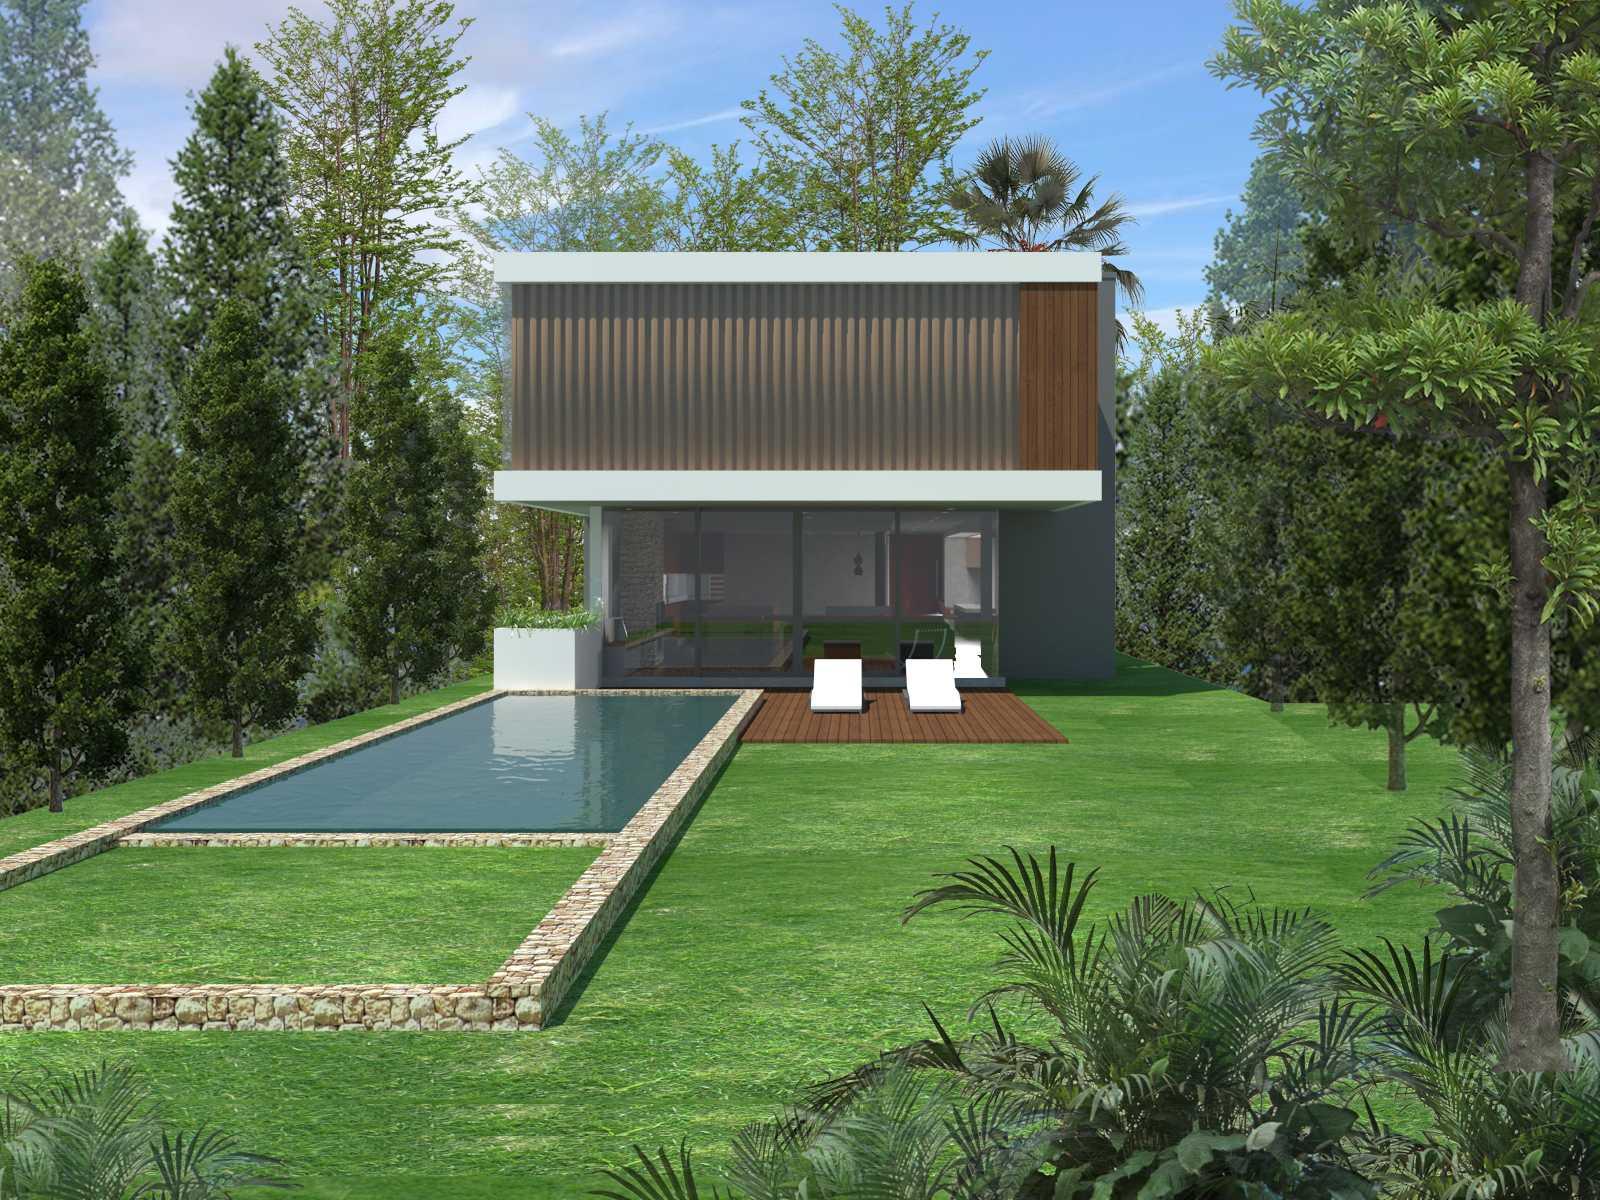 Beni Sabara Gymea Bay House Gymea Bay Nsw 2227, Australia Gymea Bay Nsw 2227, Australia Beni-Sabara-Gymea-Bay-House   85945